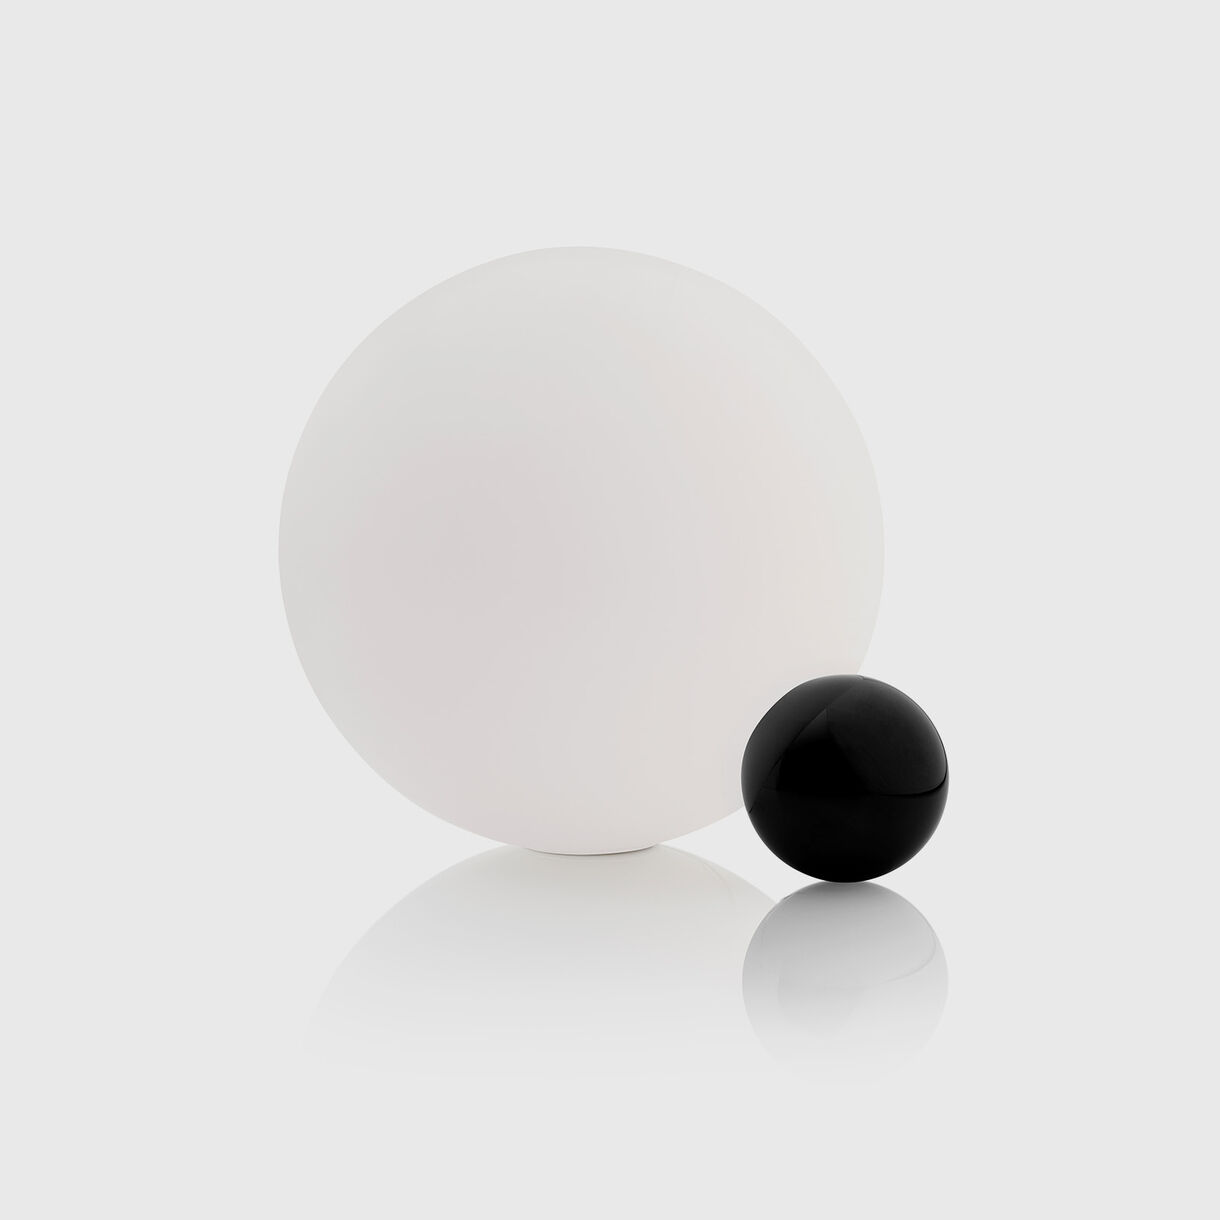 Copycat Table Lamp, Black